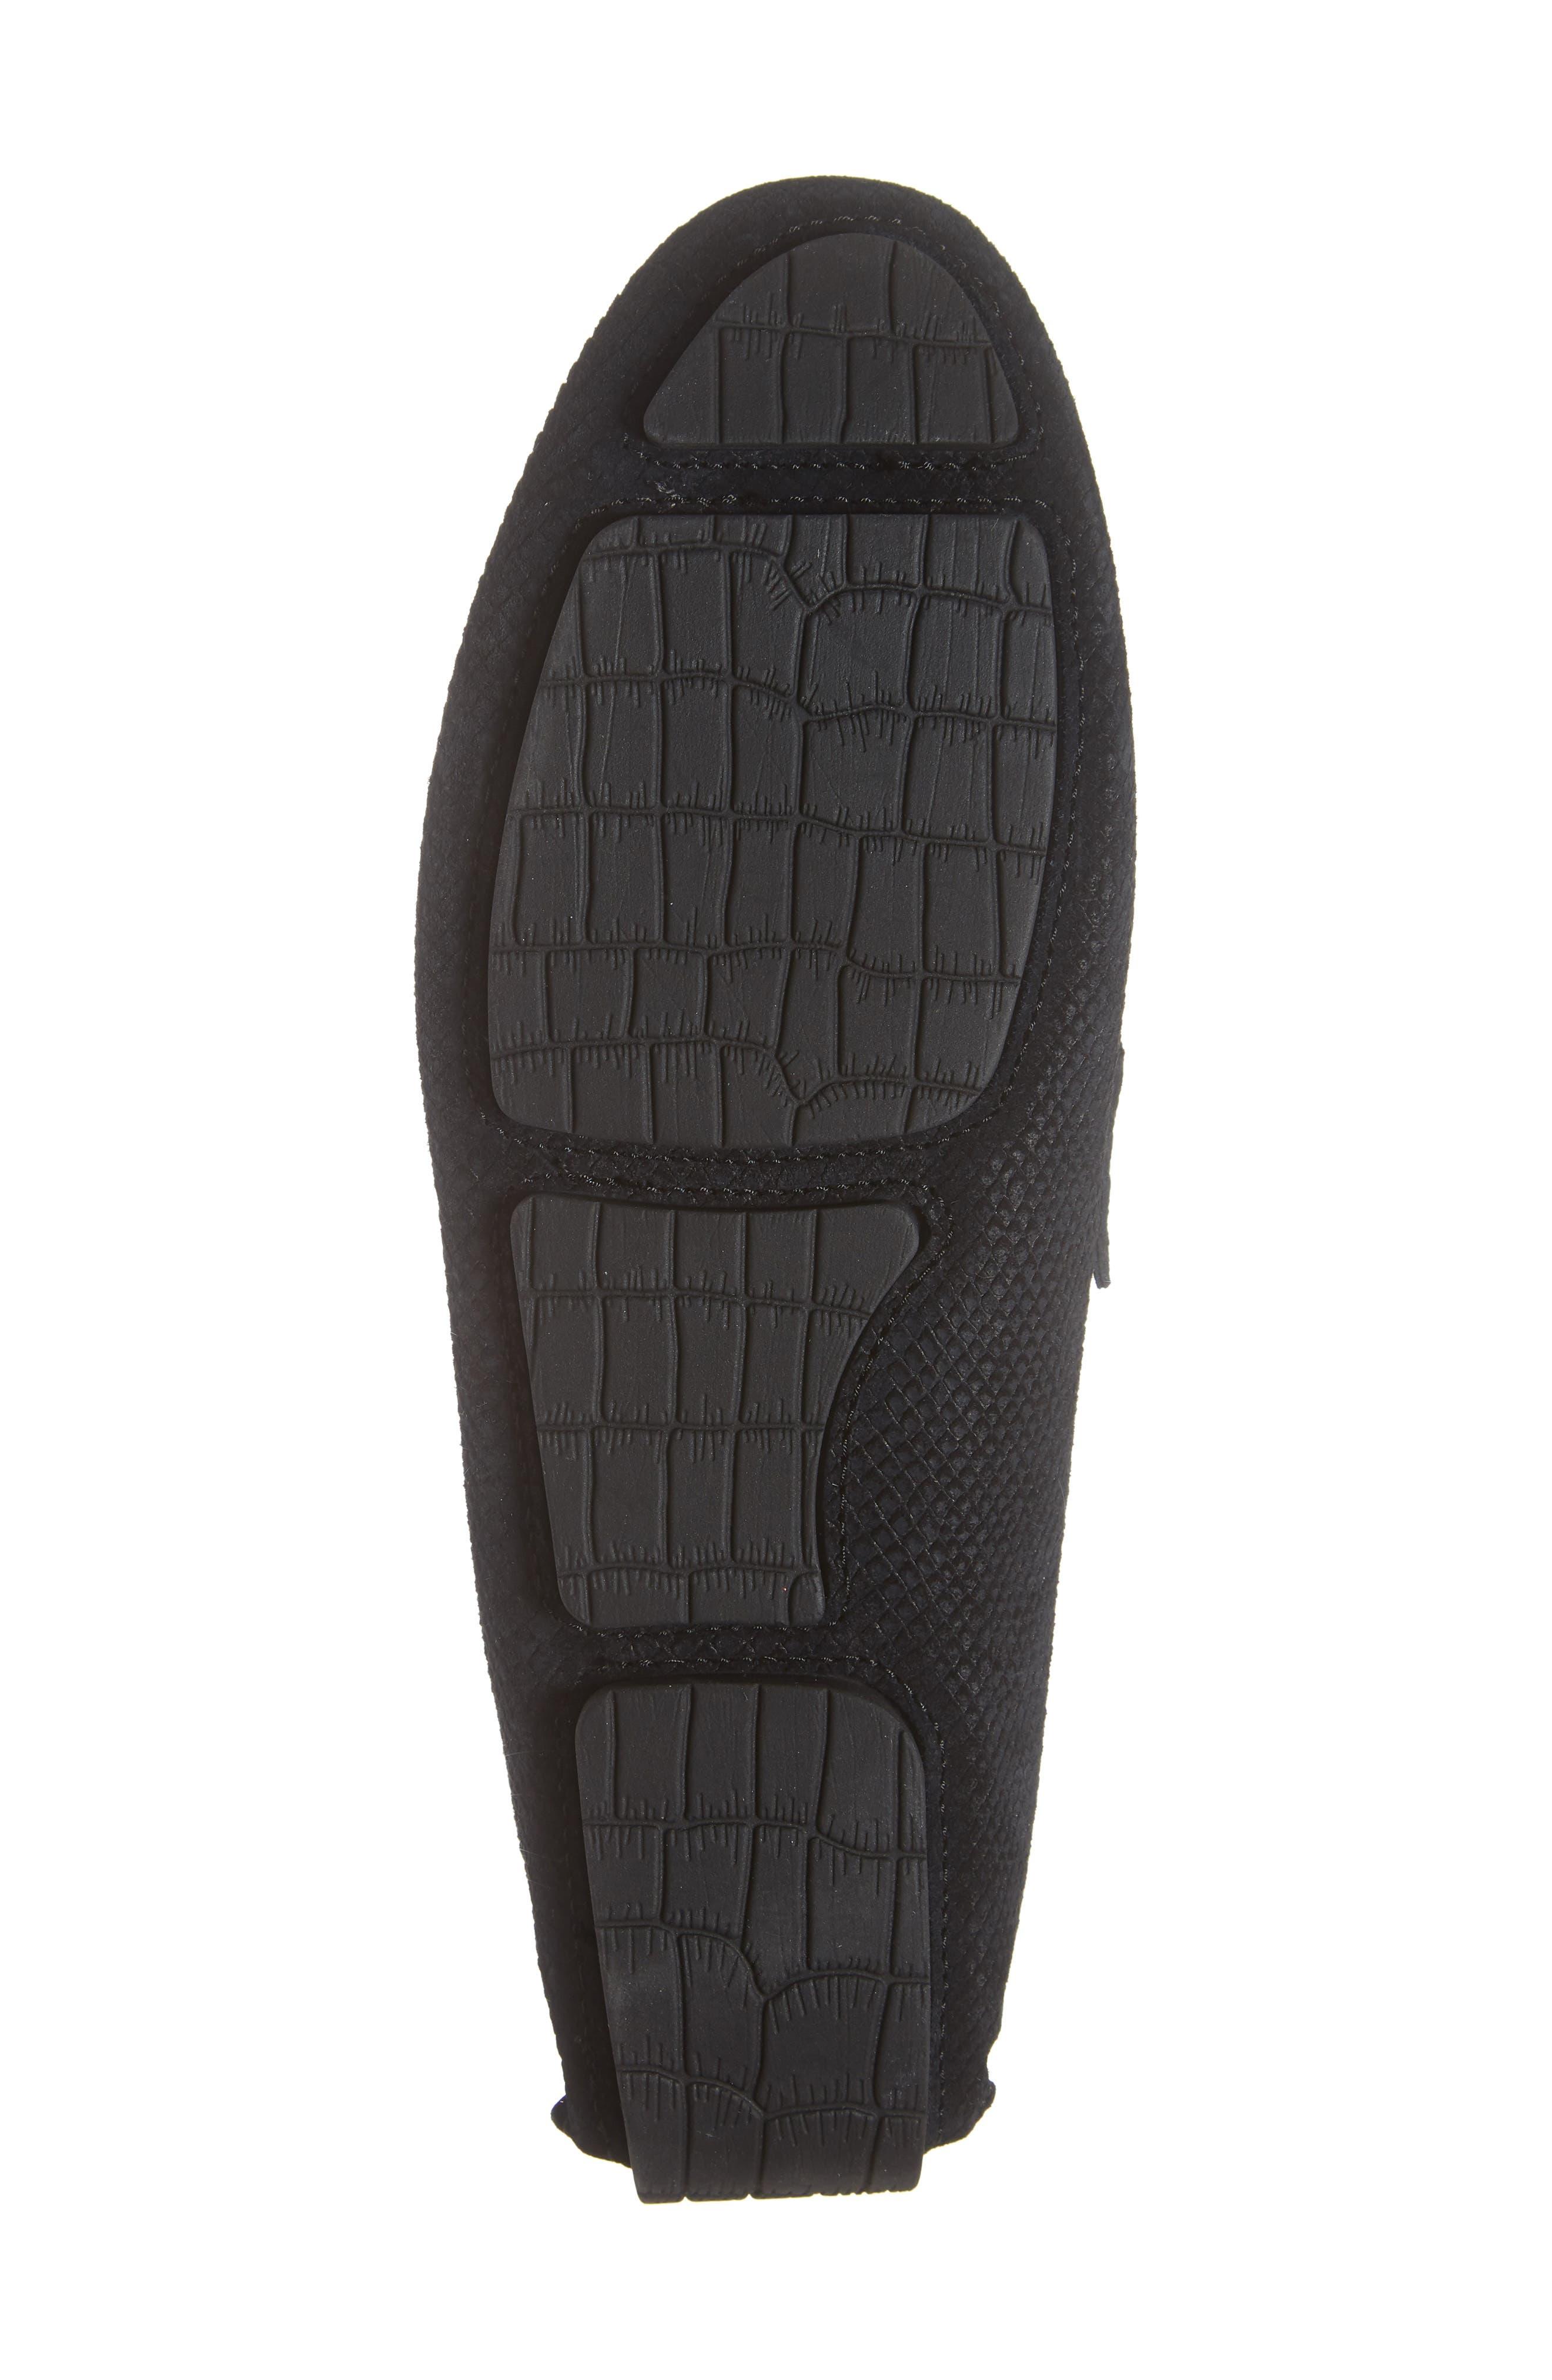 Brewer Croc Textured Driving Loafer,                             Alternate thumbnail 6, color,                             BLACK/BLACK